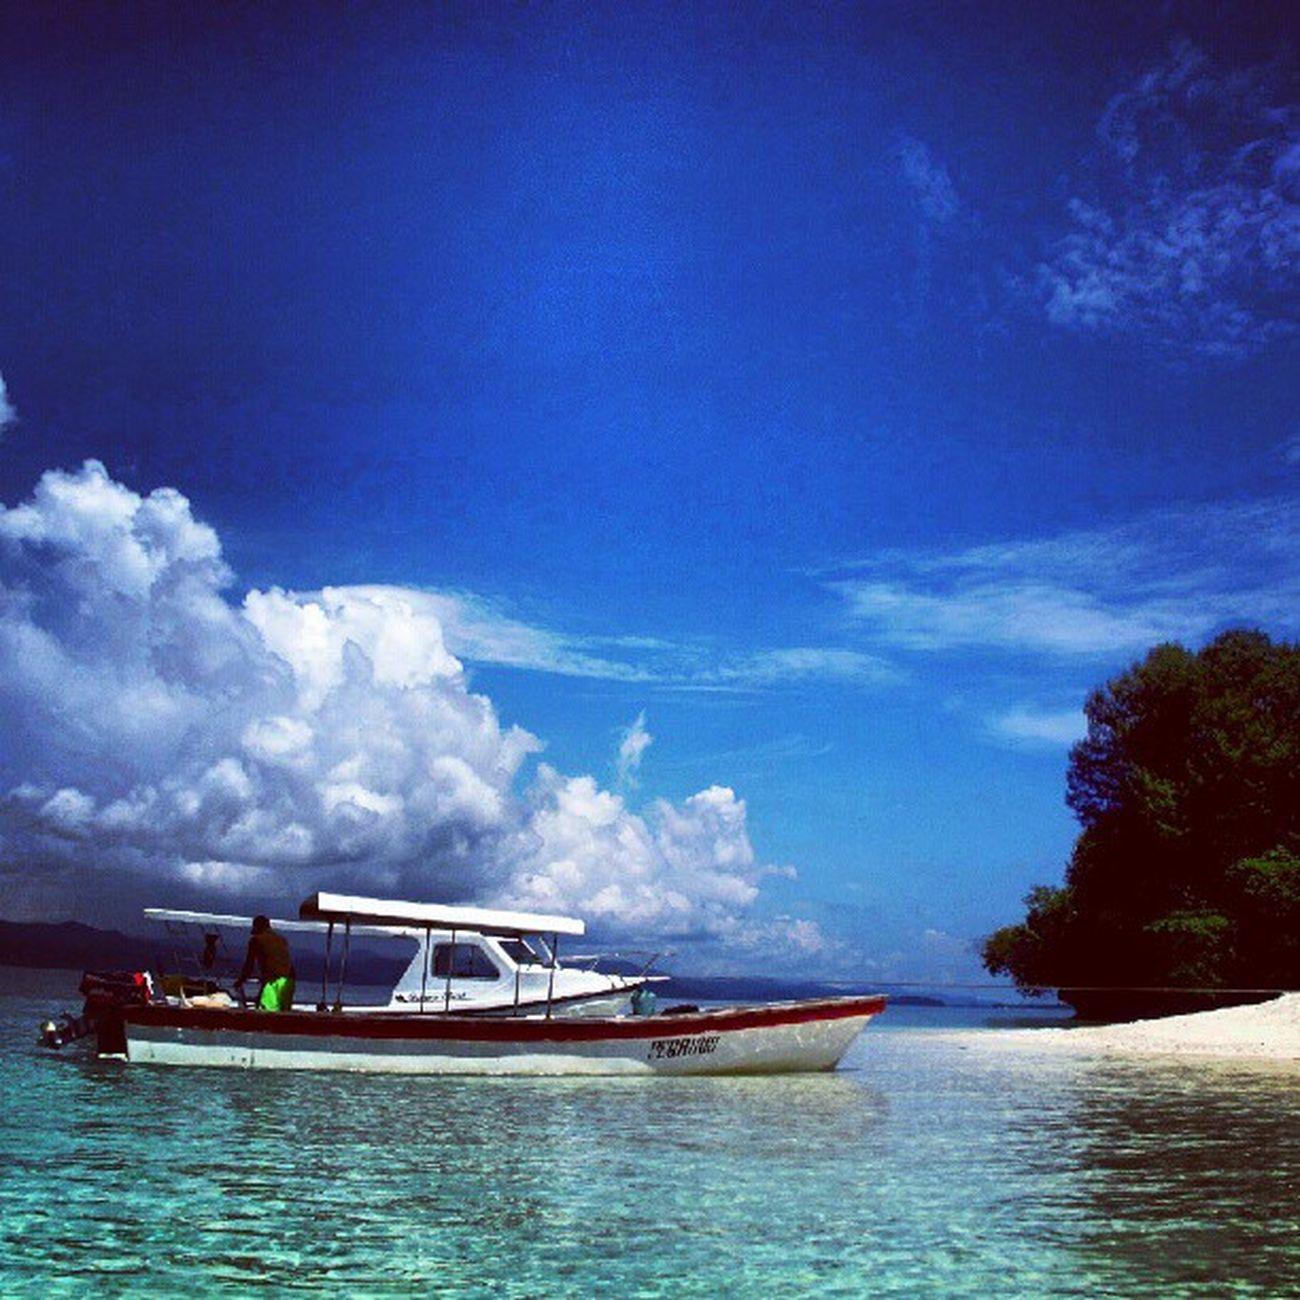 Diving Divetrip Liquiddive Rajaampat island beach sea indonesia instadonesia instanusantara instagram instacool traveling underwater photography doubletap followme